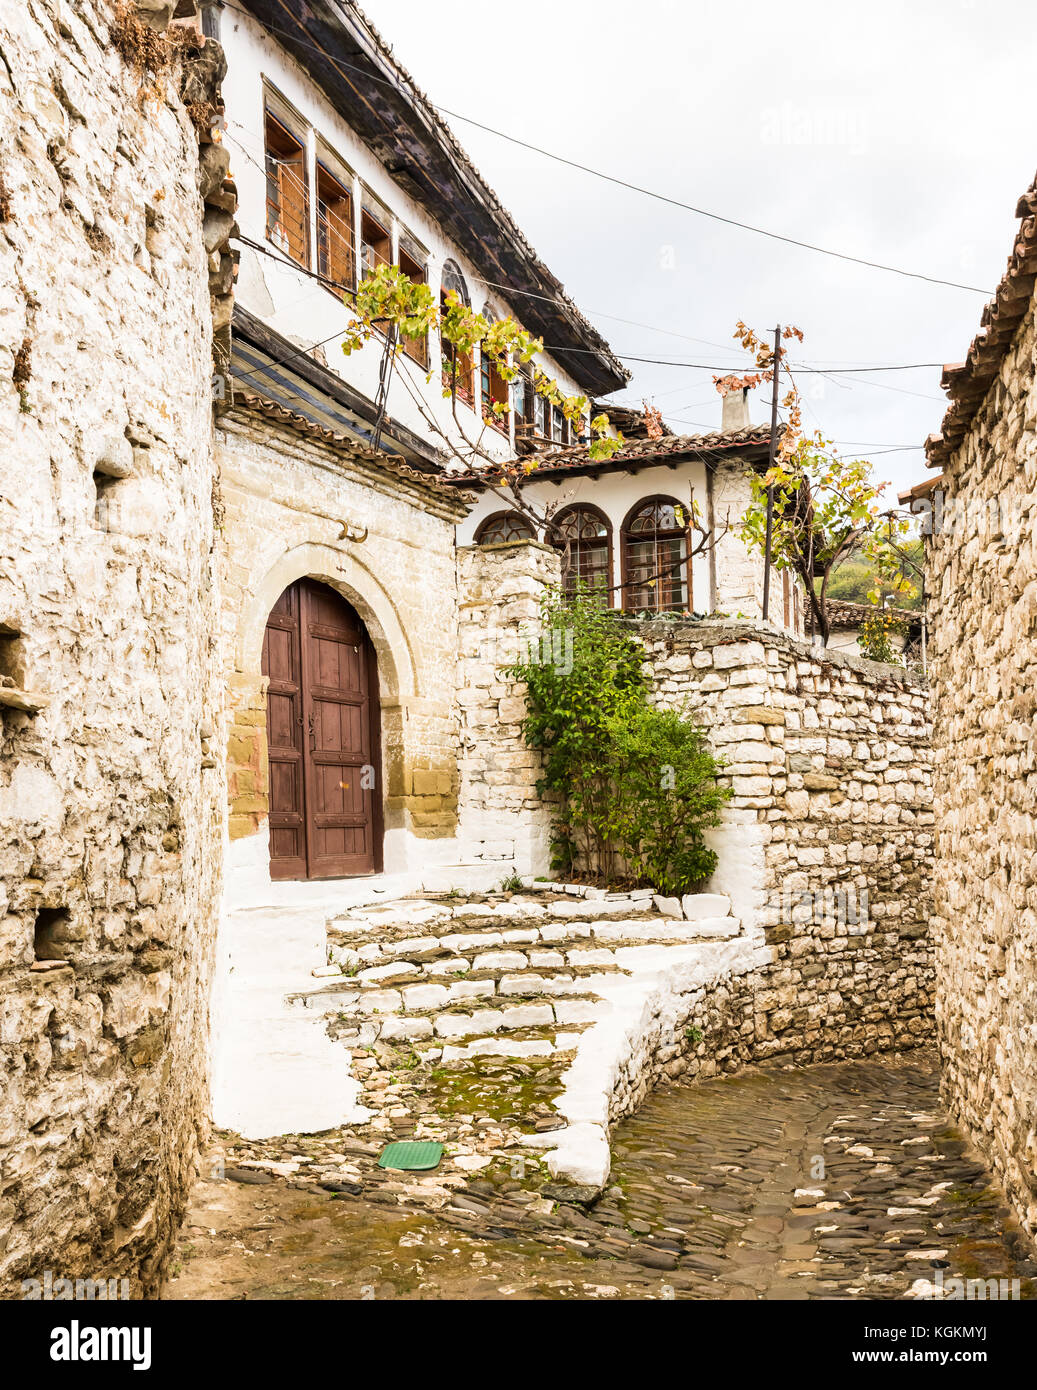 The city of Berat in Albania - Stock Image